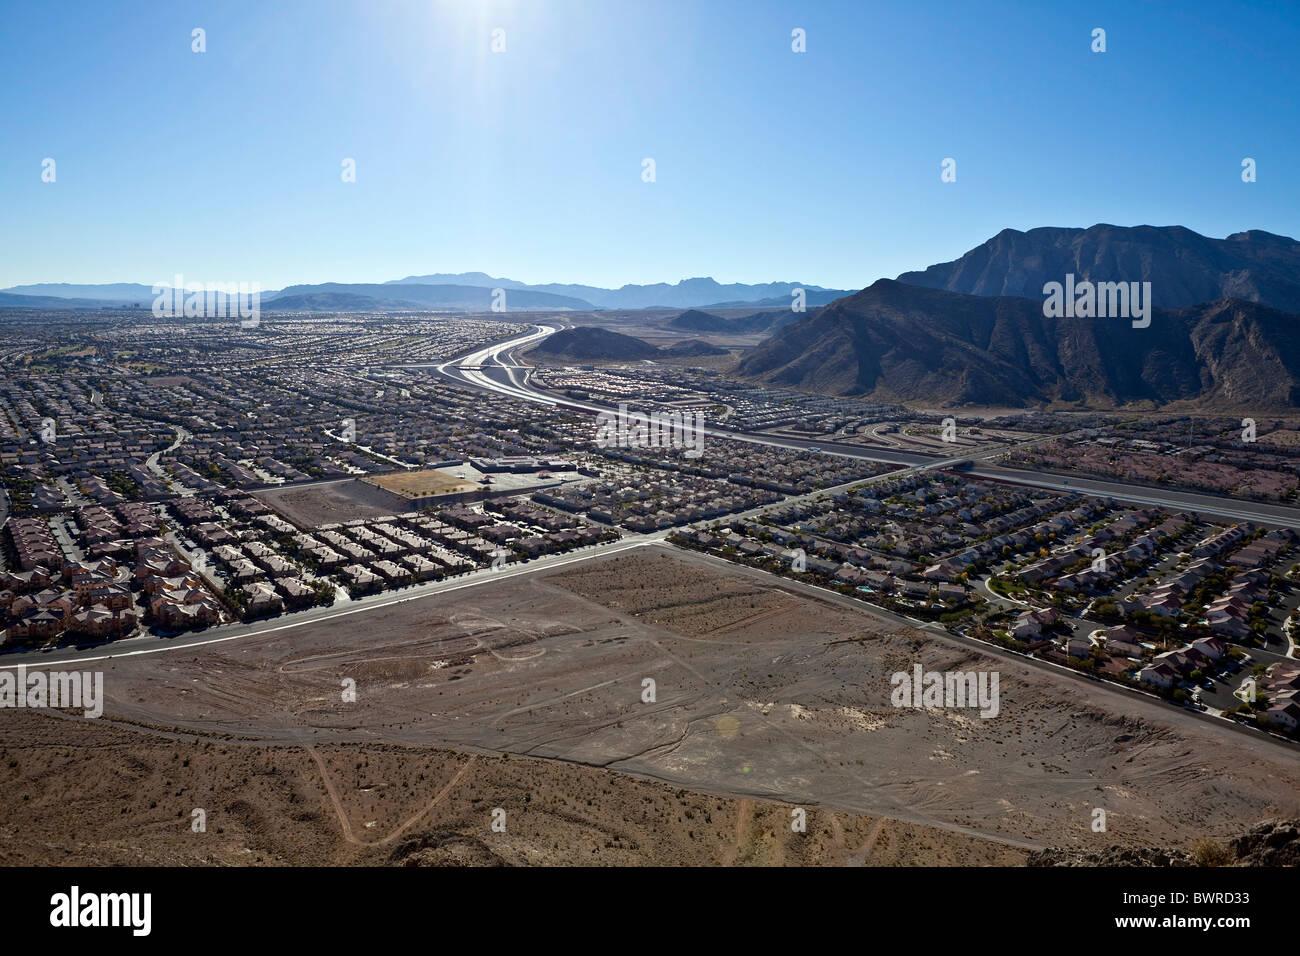 Desert suburban sprawl viewed from Lone Mountain peak towards the Summerlin neighborhood of Las Vegas Nevada. - Stock Image